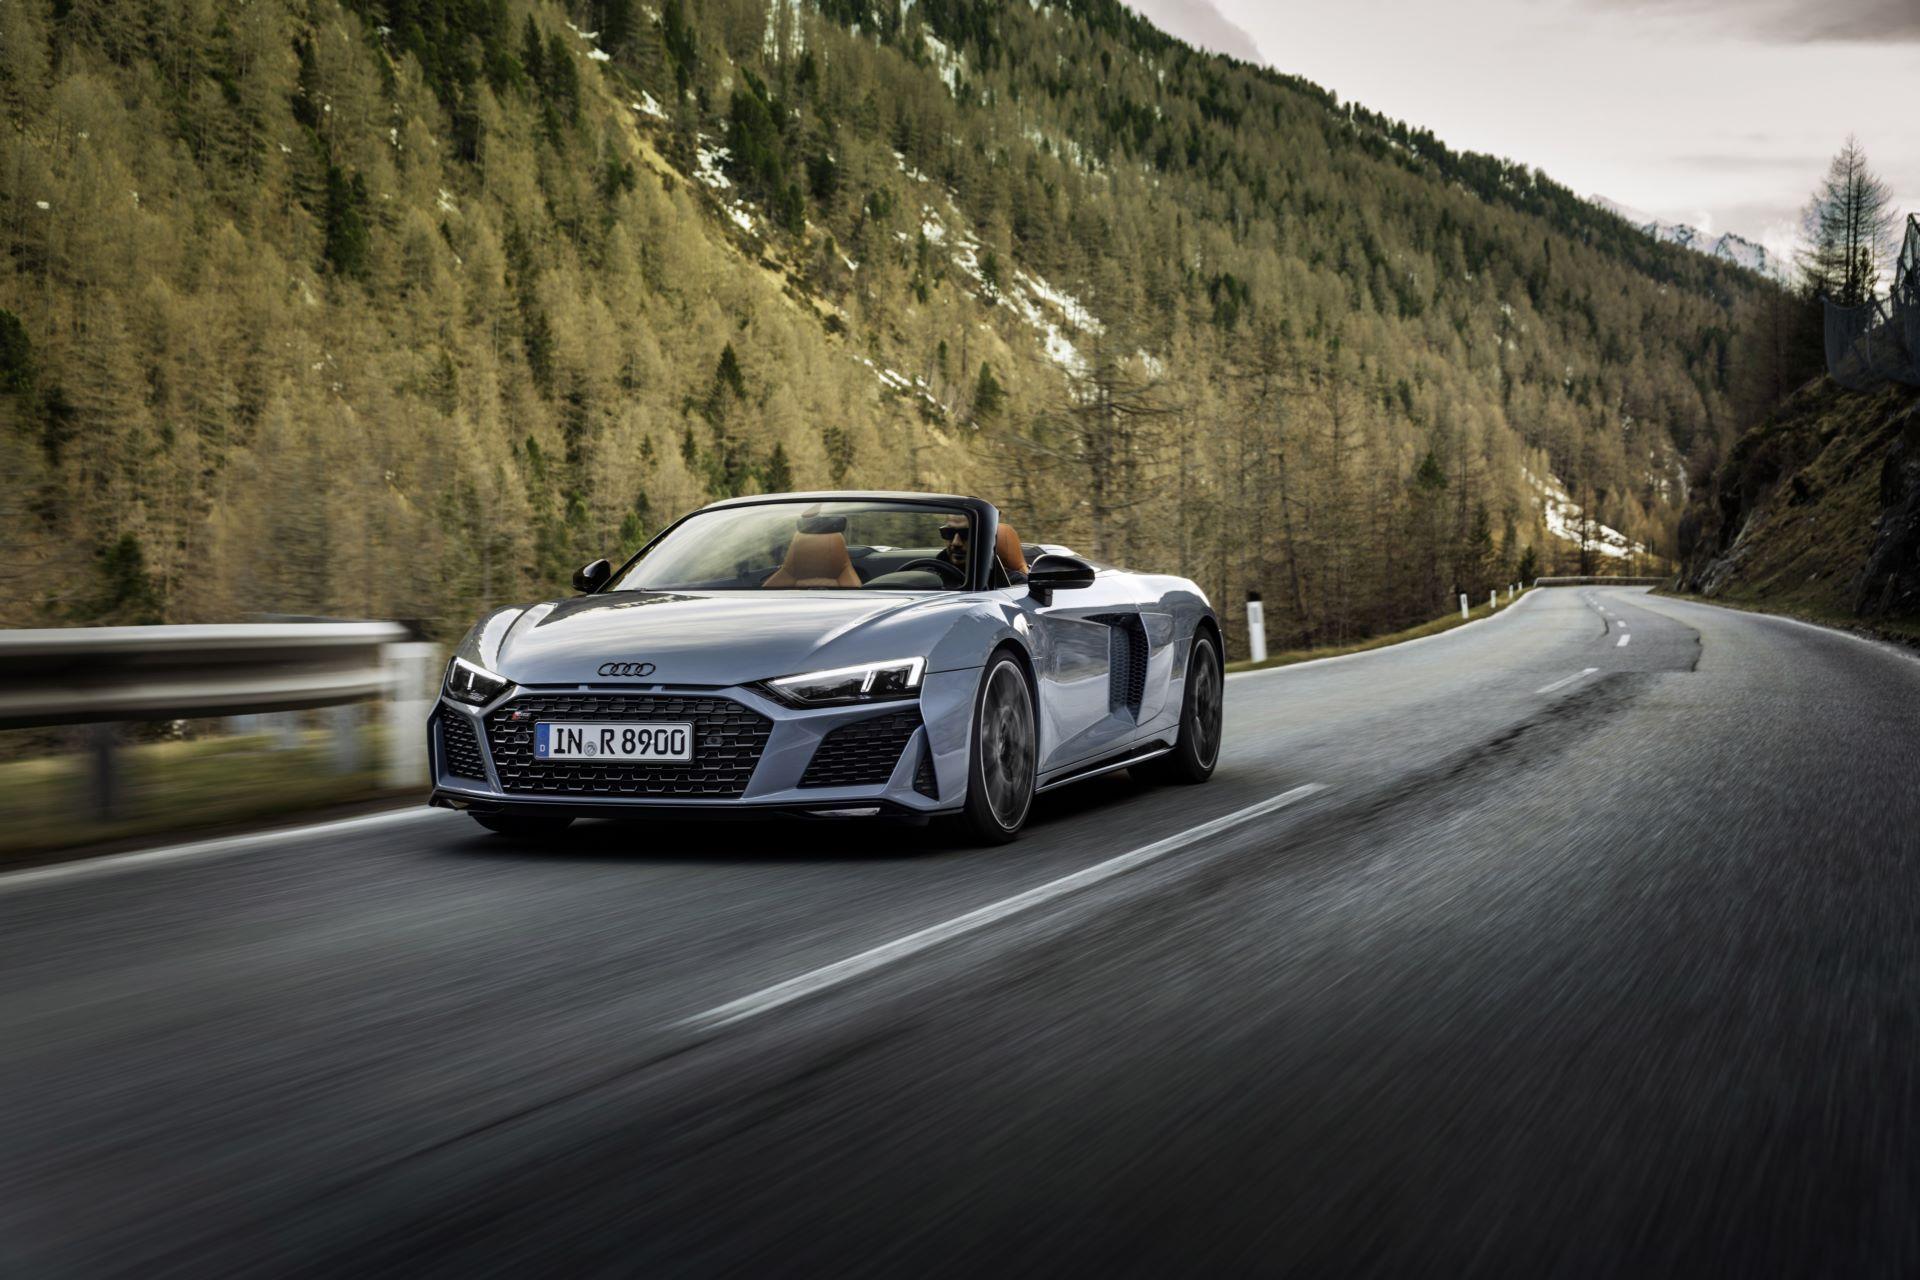 Audi-R8-V10-Performance-RWD-3